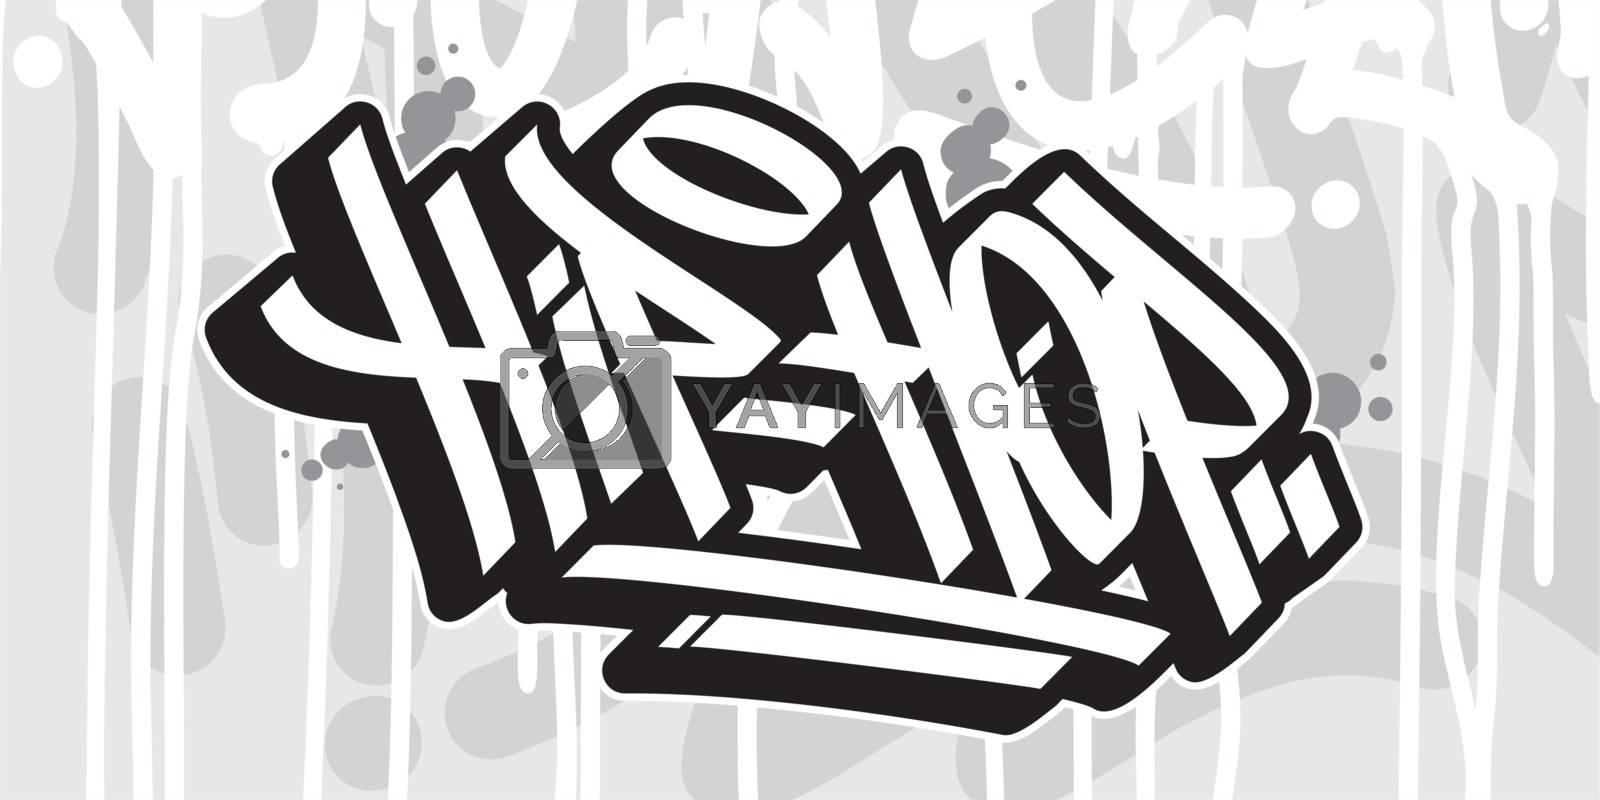 Word Hip Hop Graffiti Style Typography